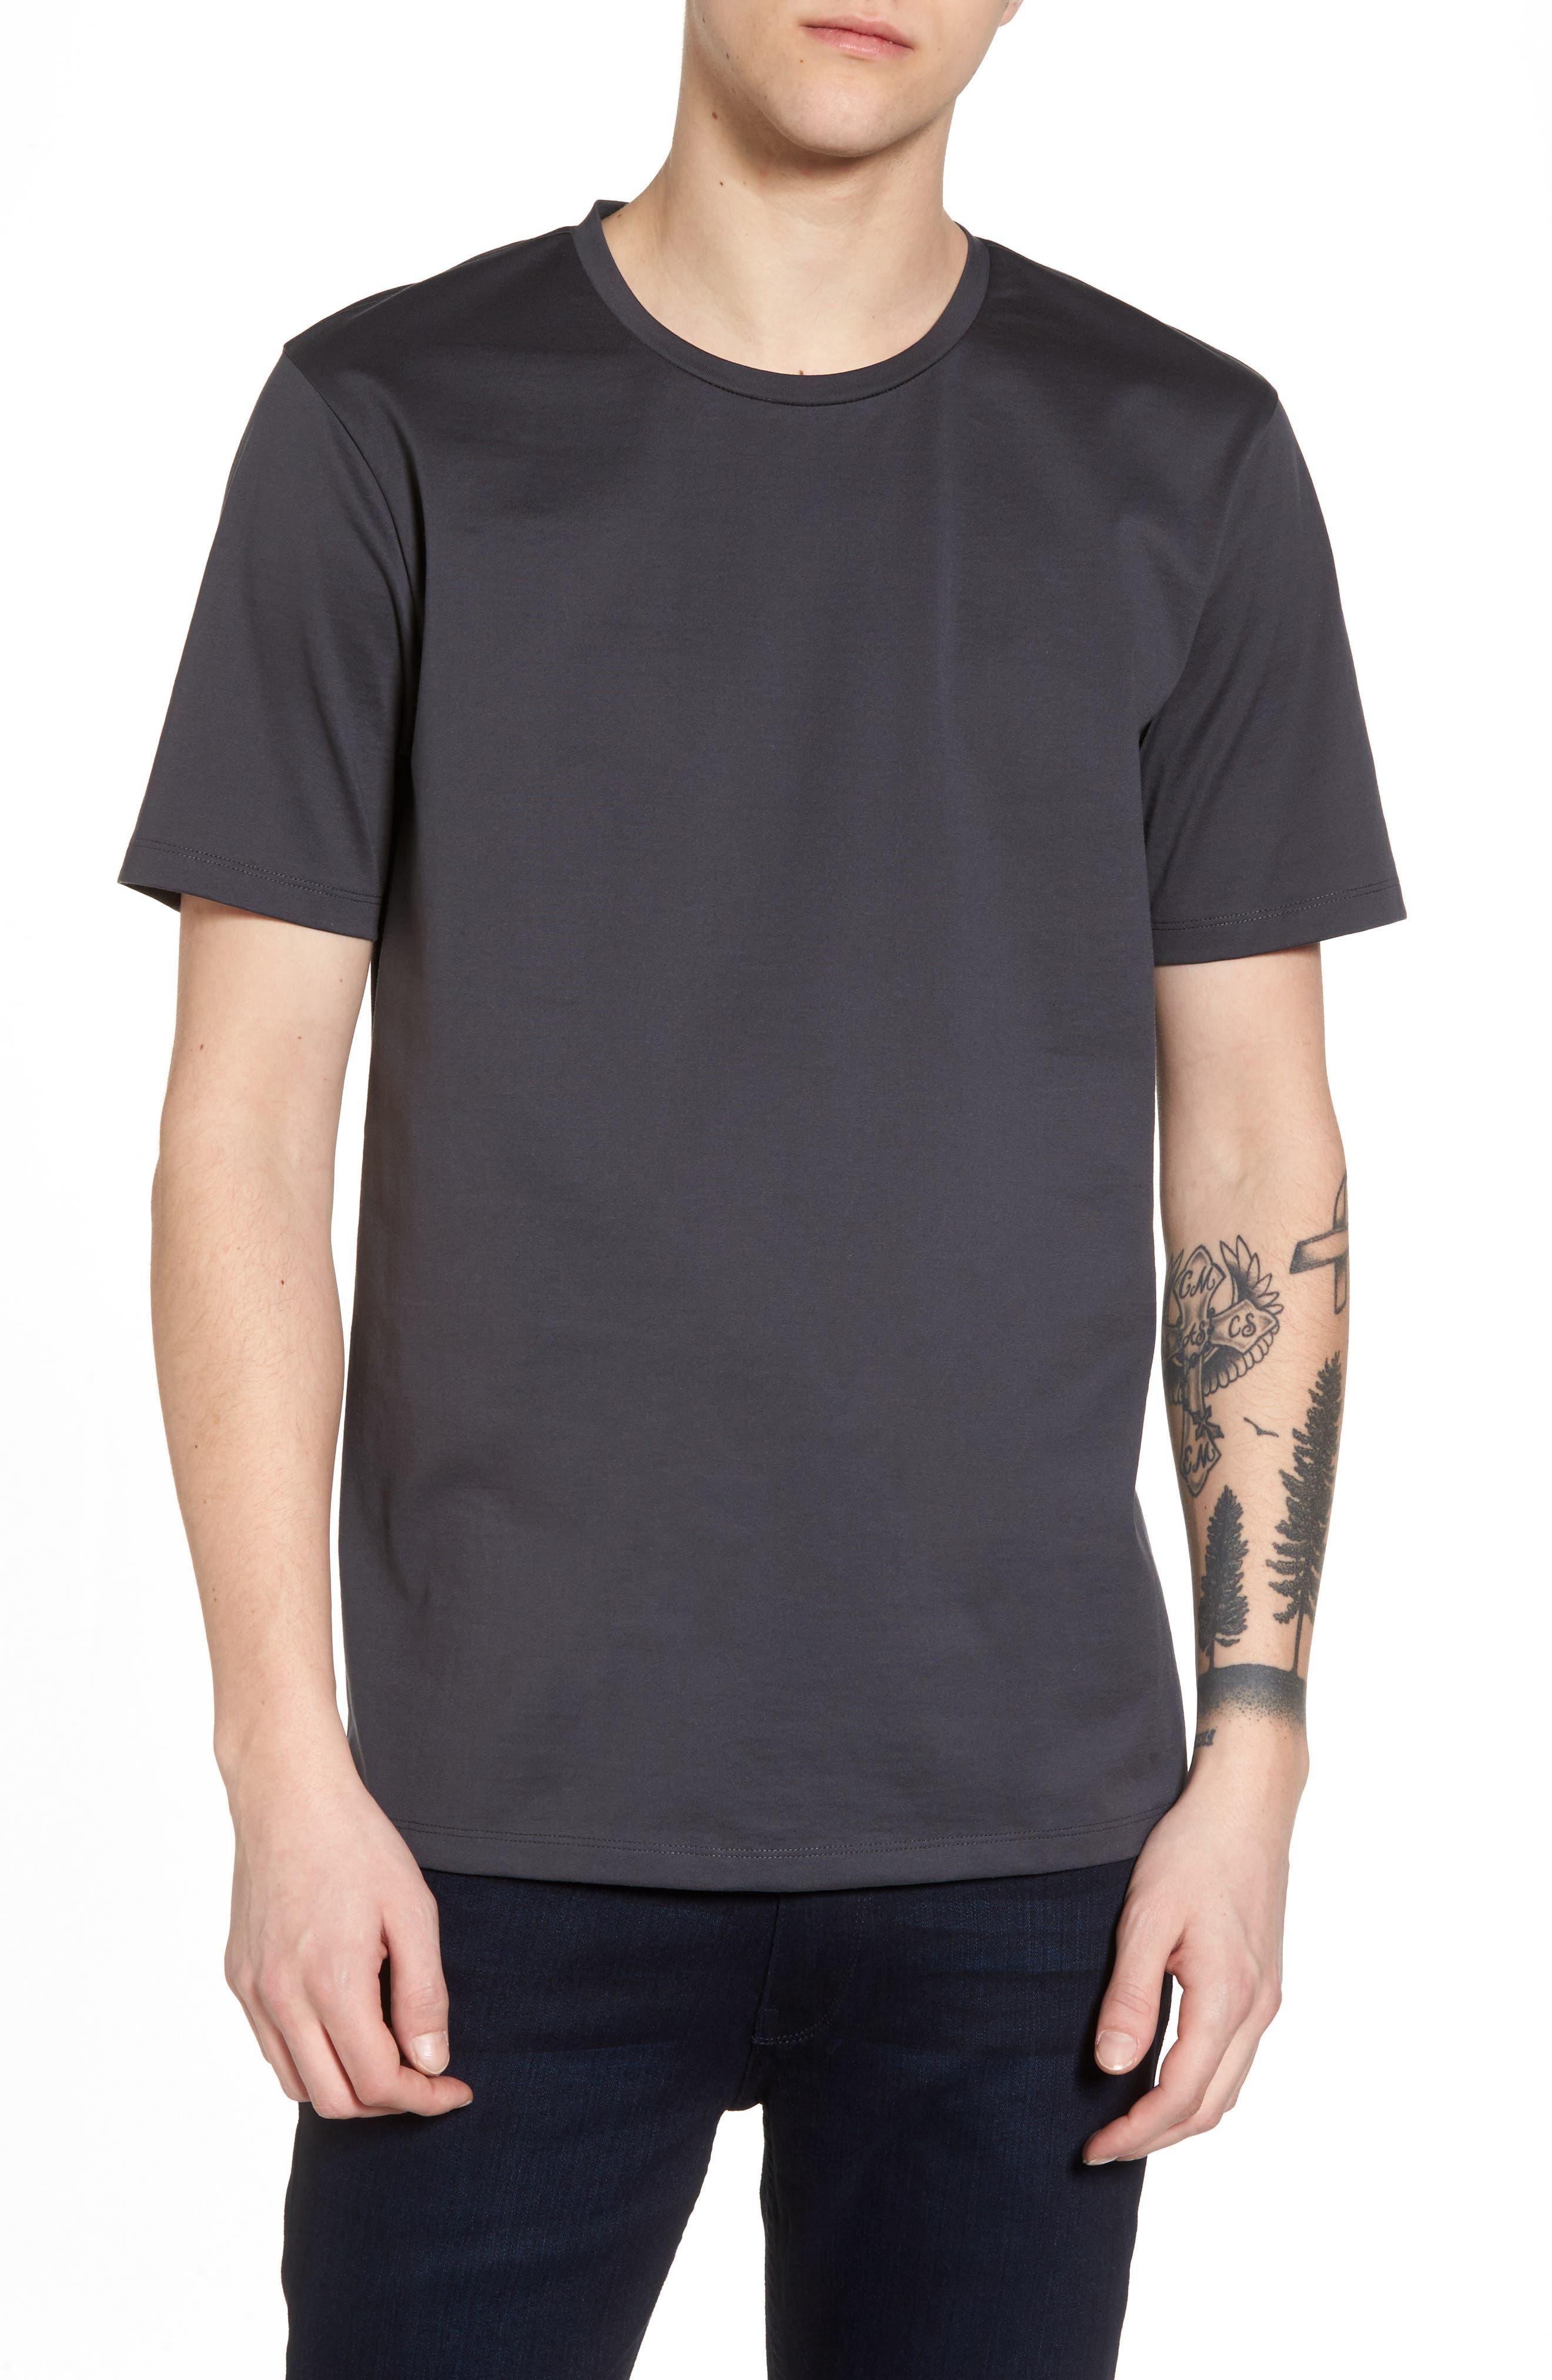 Calibrate Mercerized Cotton Crewneck T-Shirt